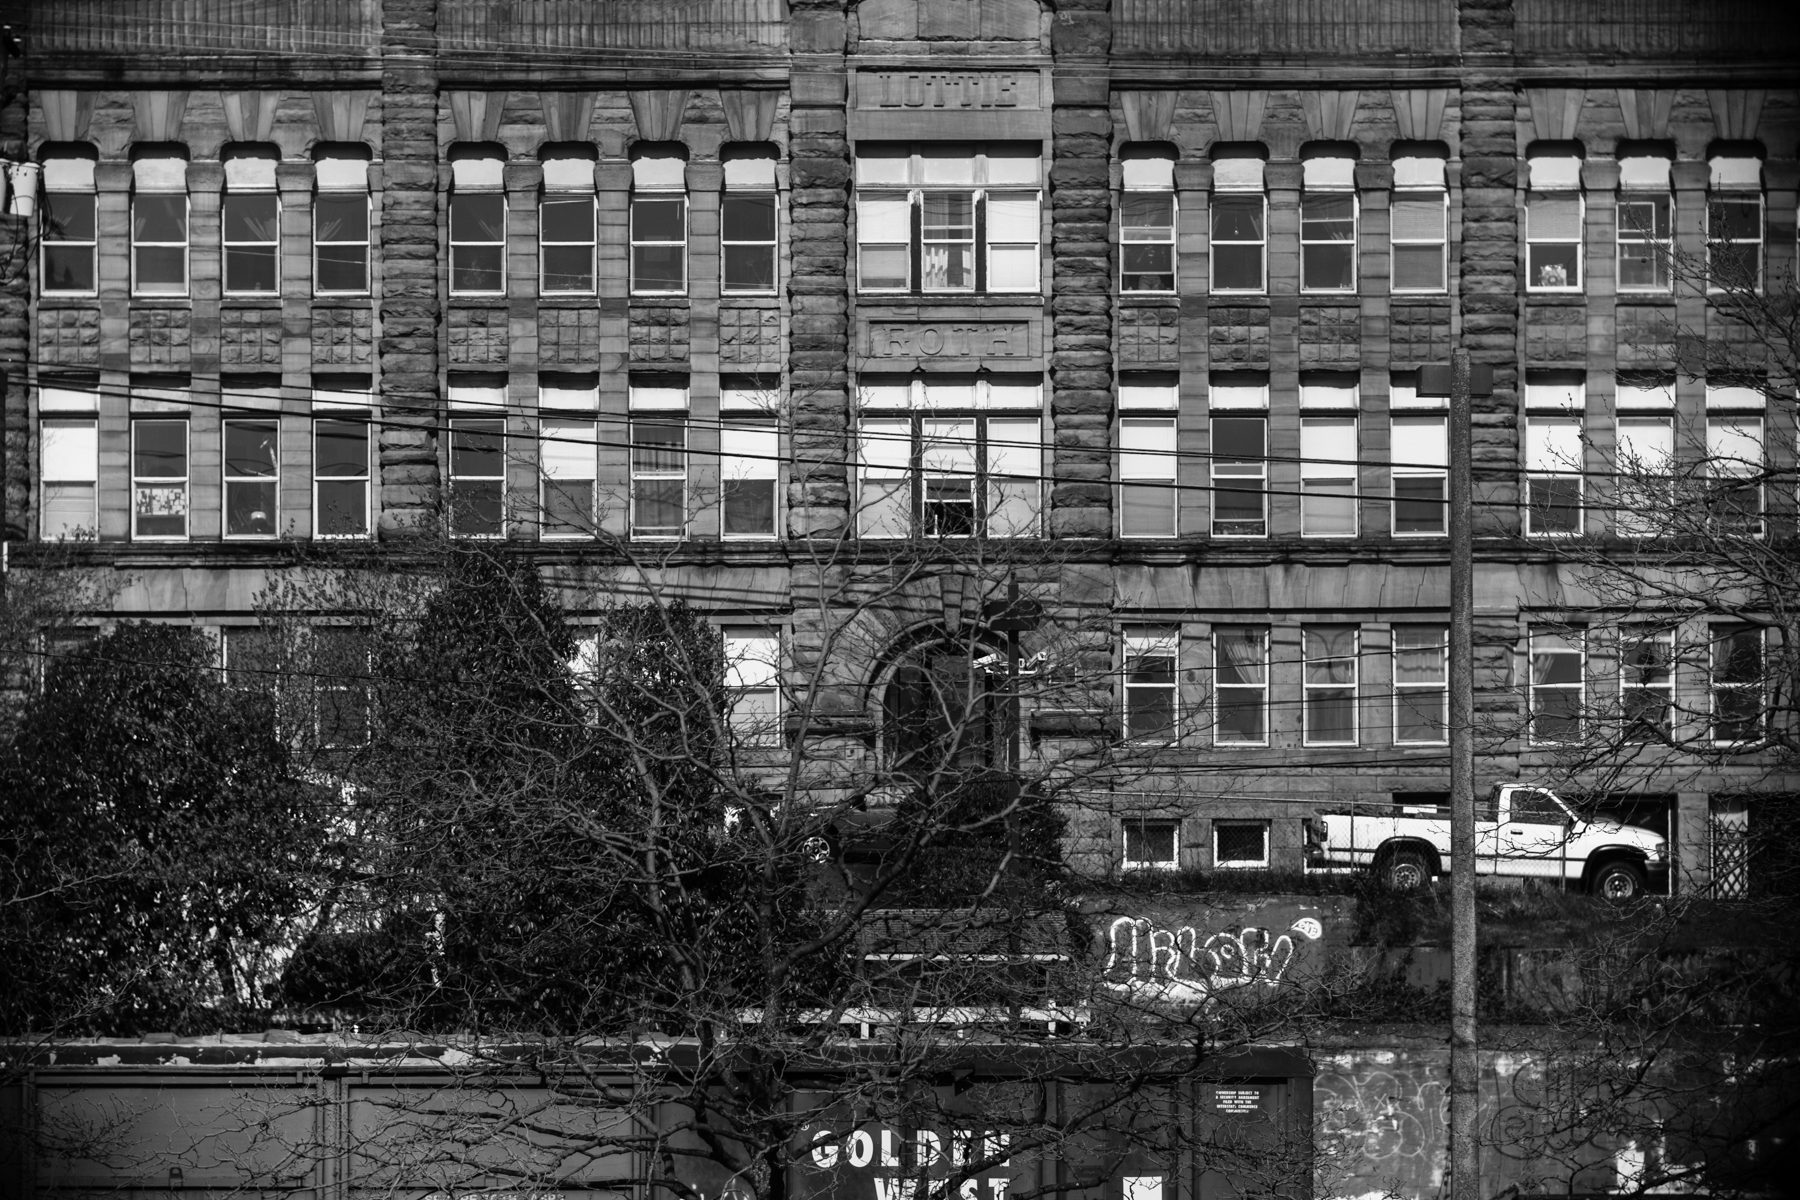 Photo: Lottie Roth Building